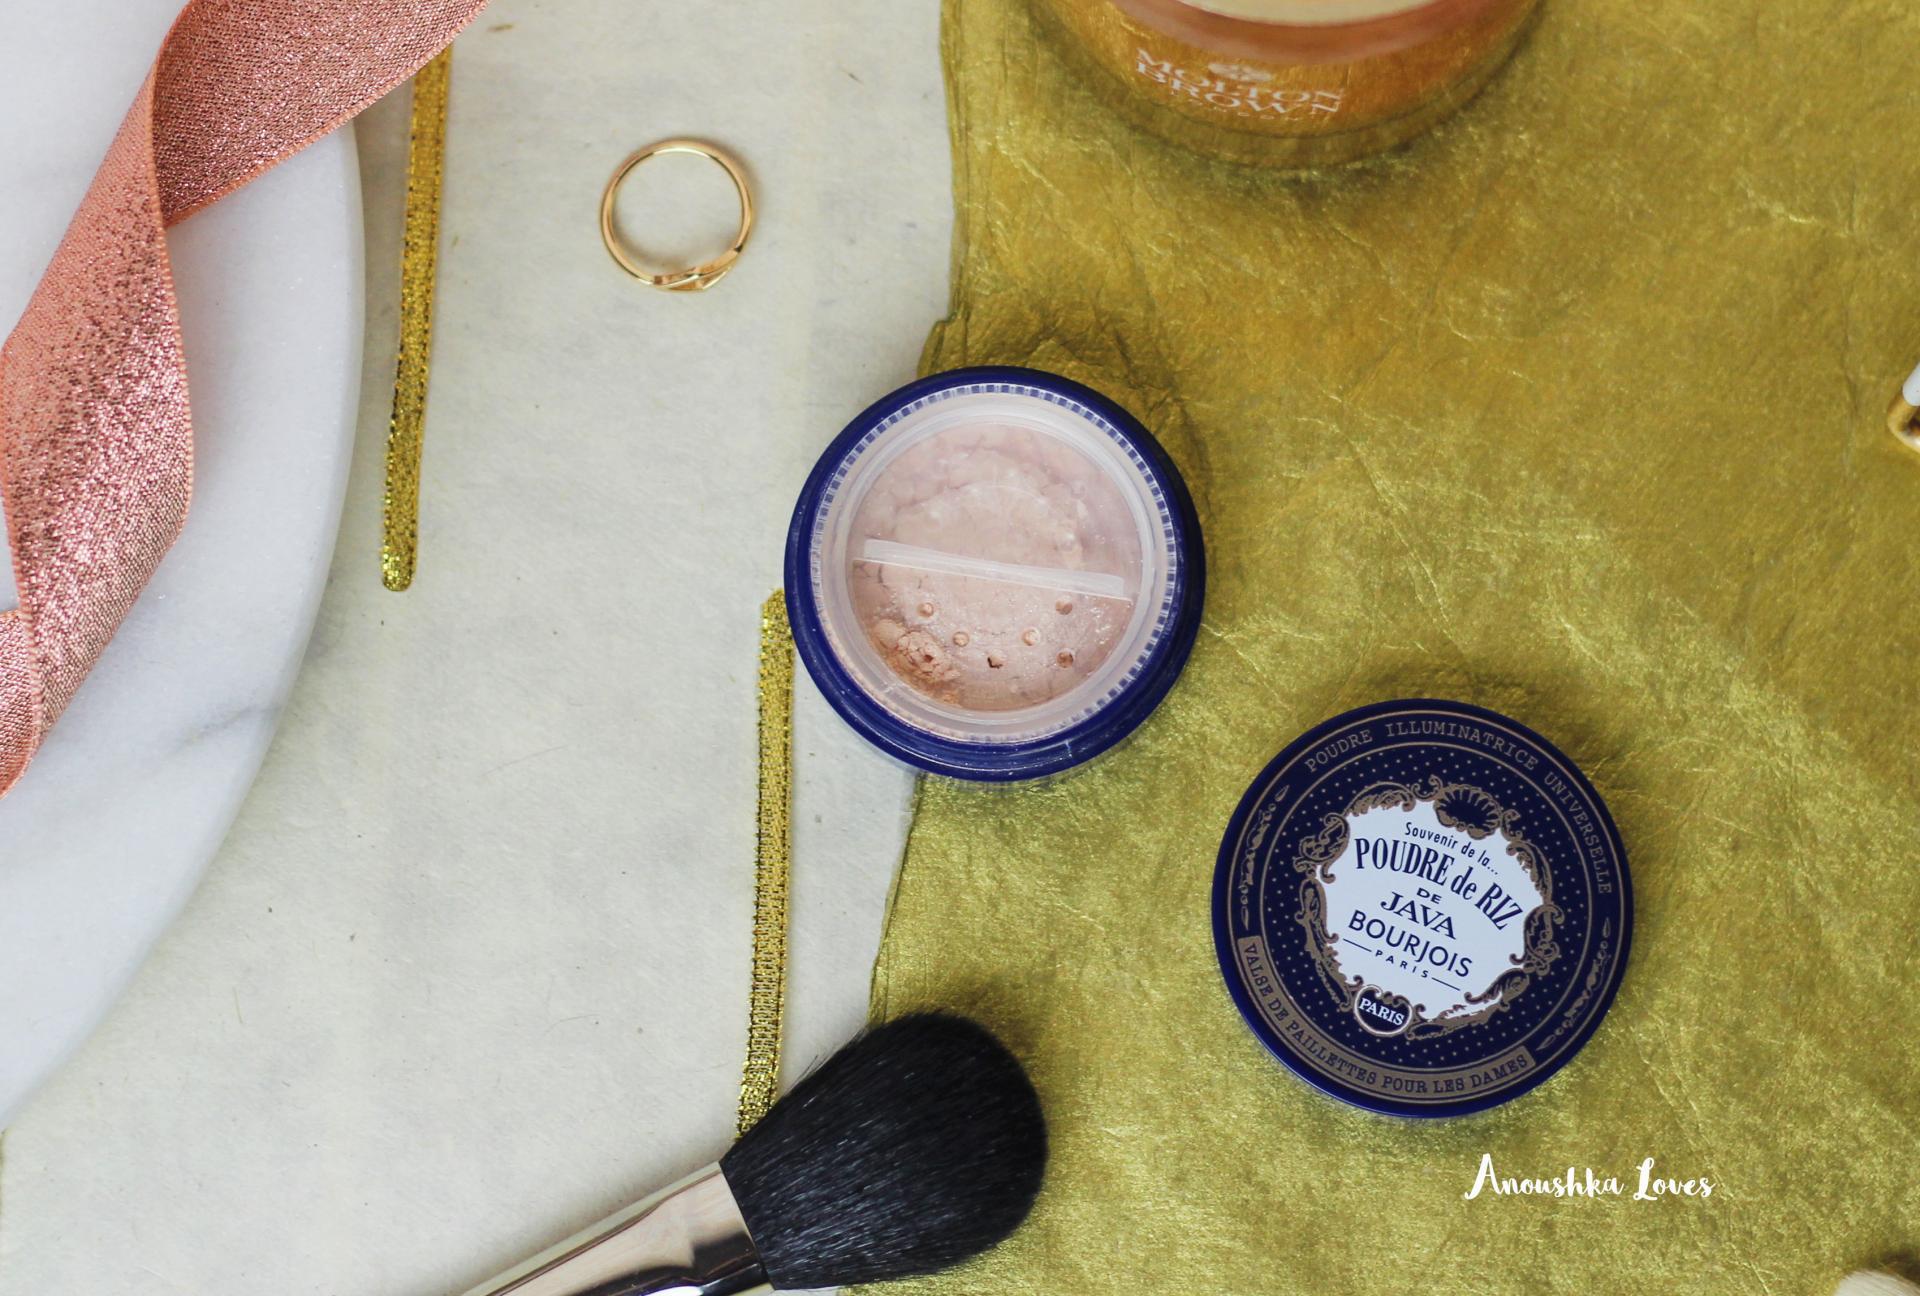 Fragrance Direct Does Makeup! Borjois Poudre Illuminatrice